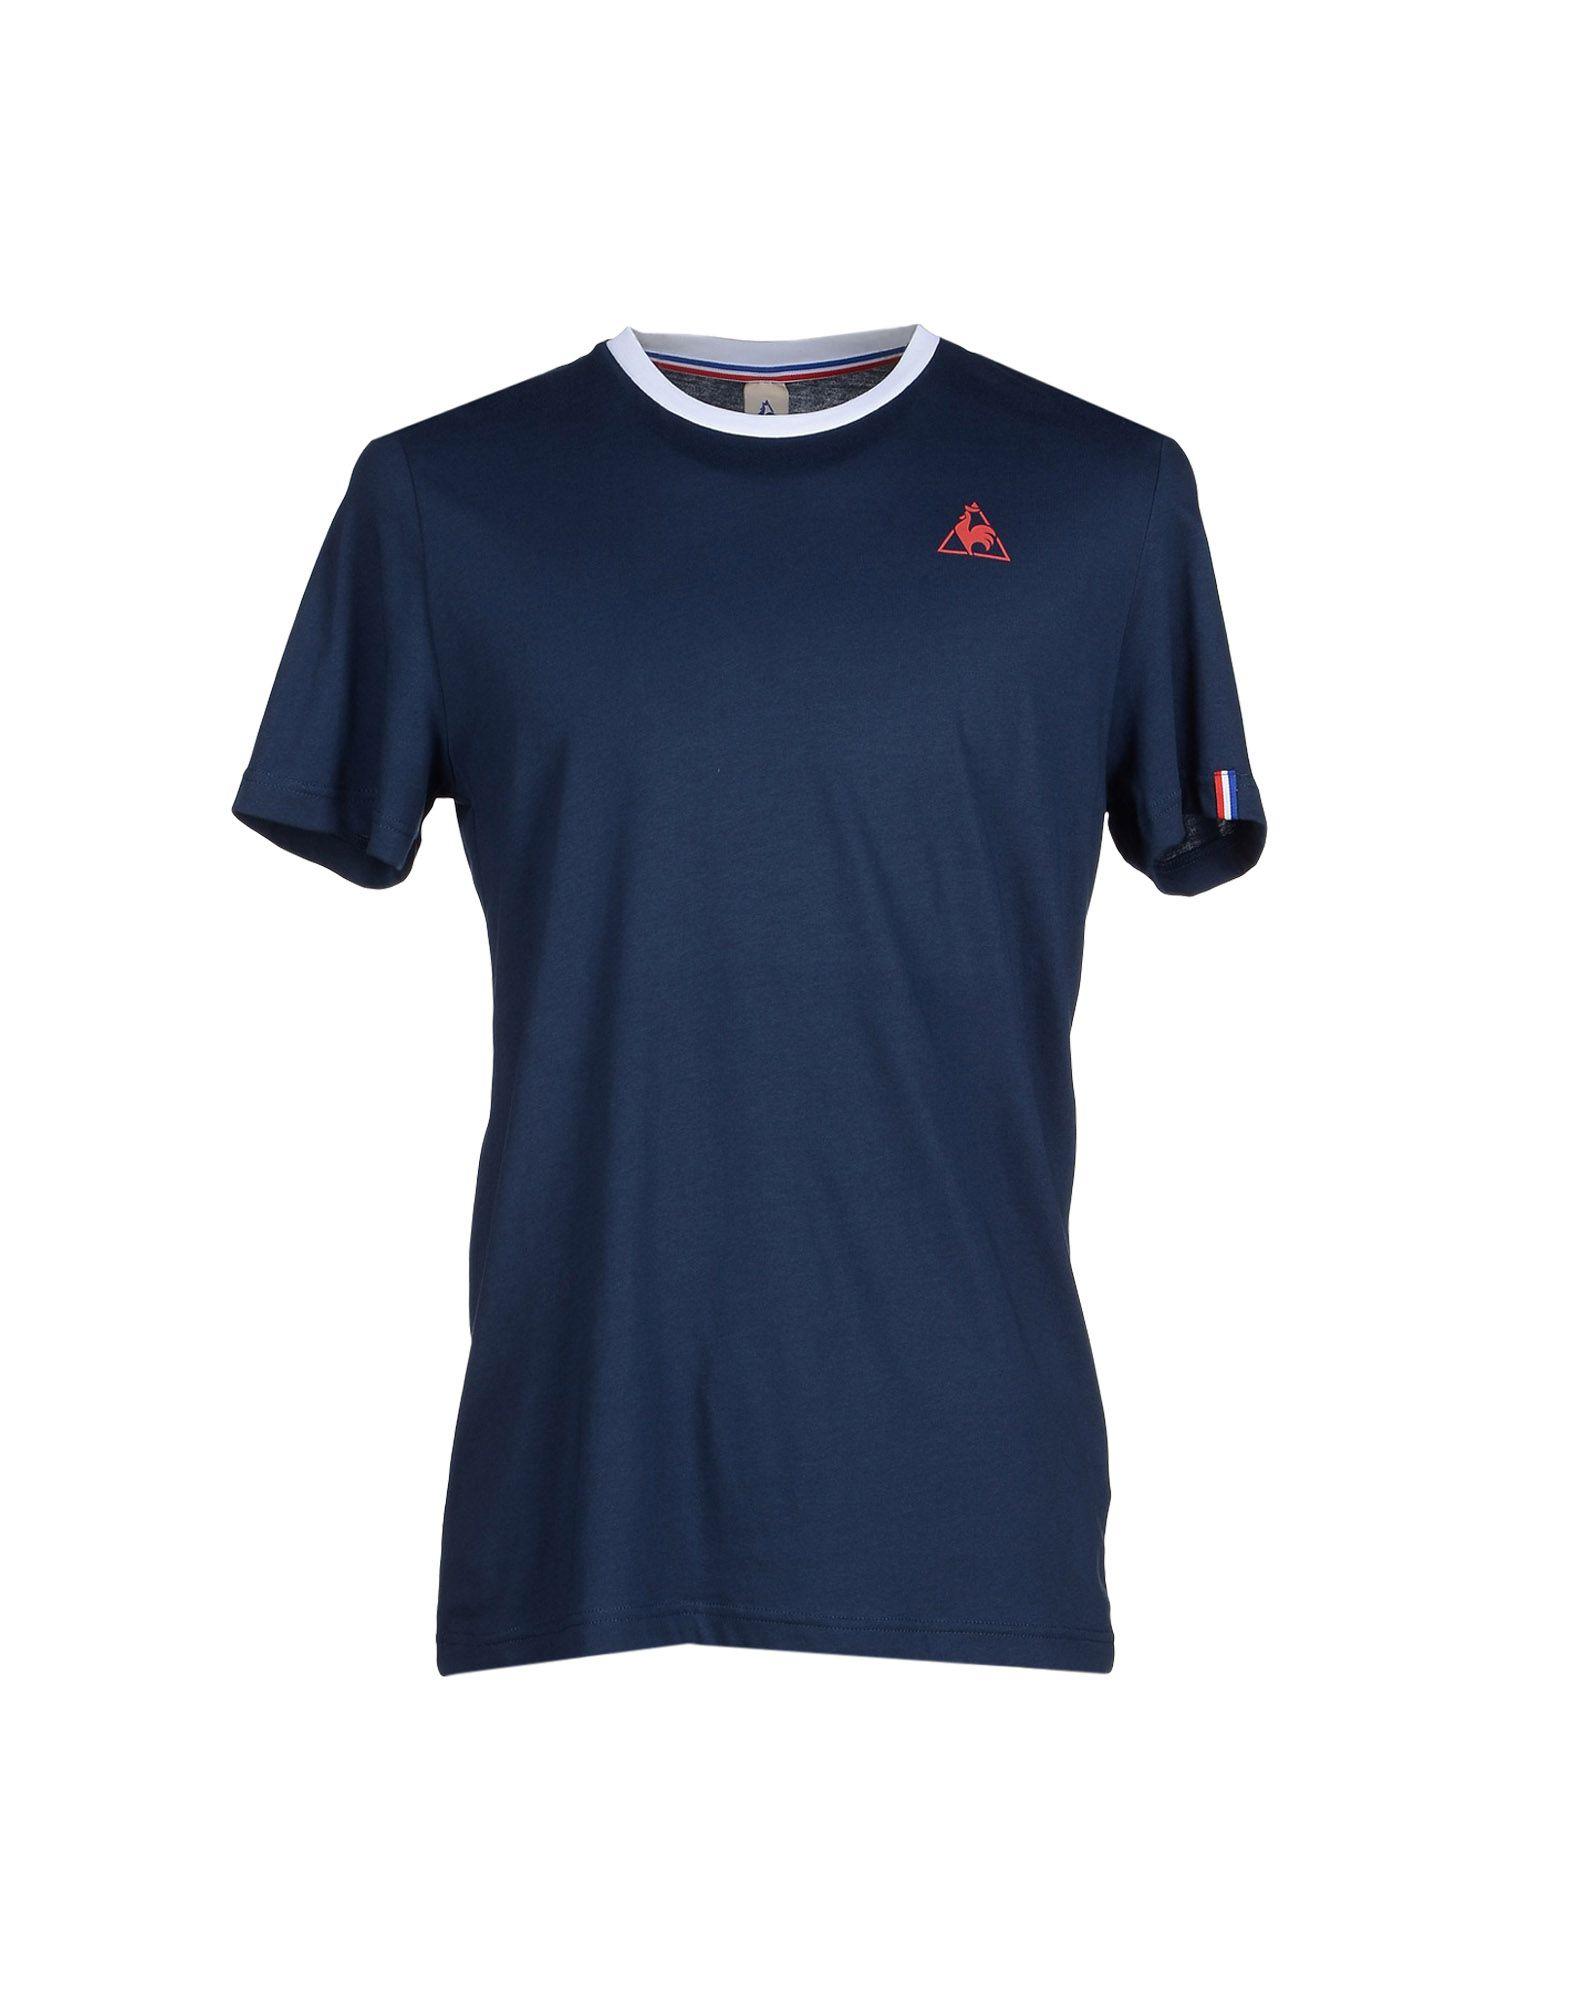 le coq sportif shirt - photo #30